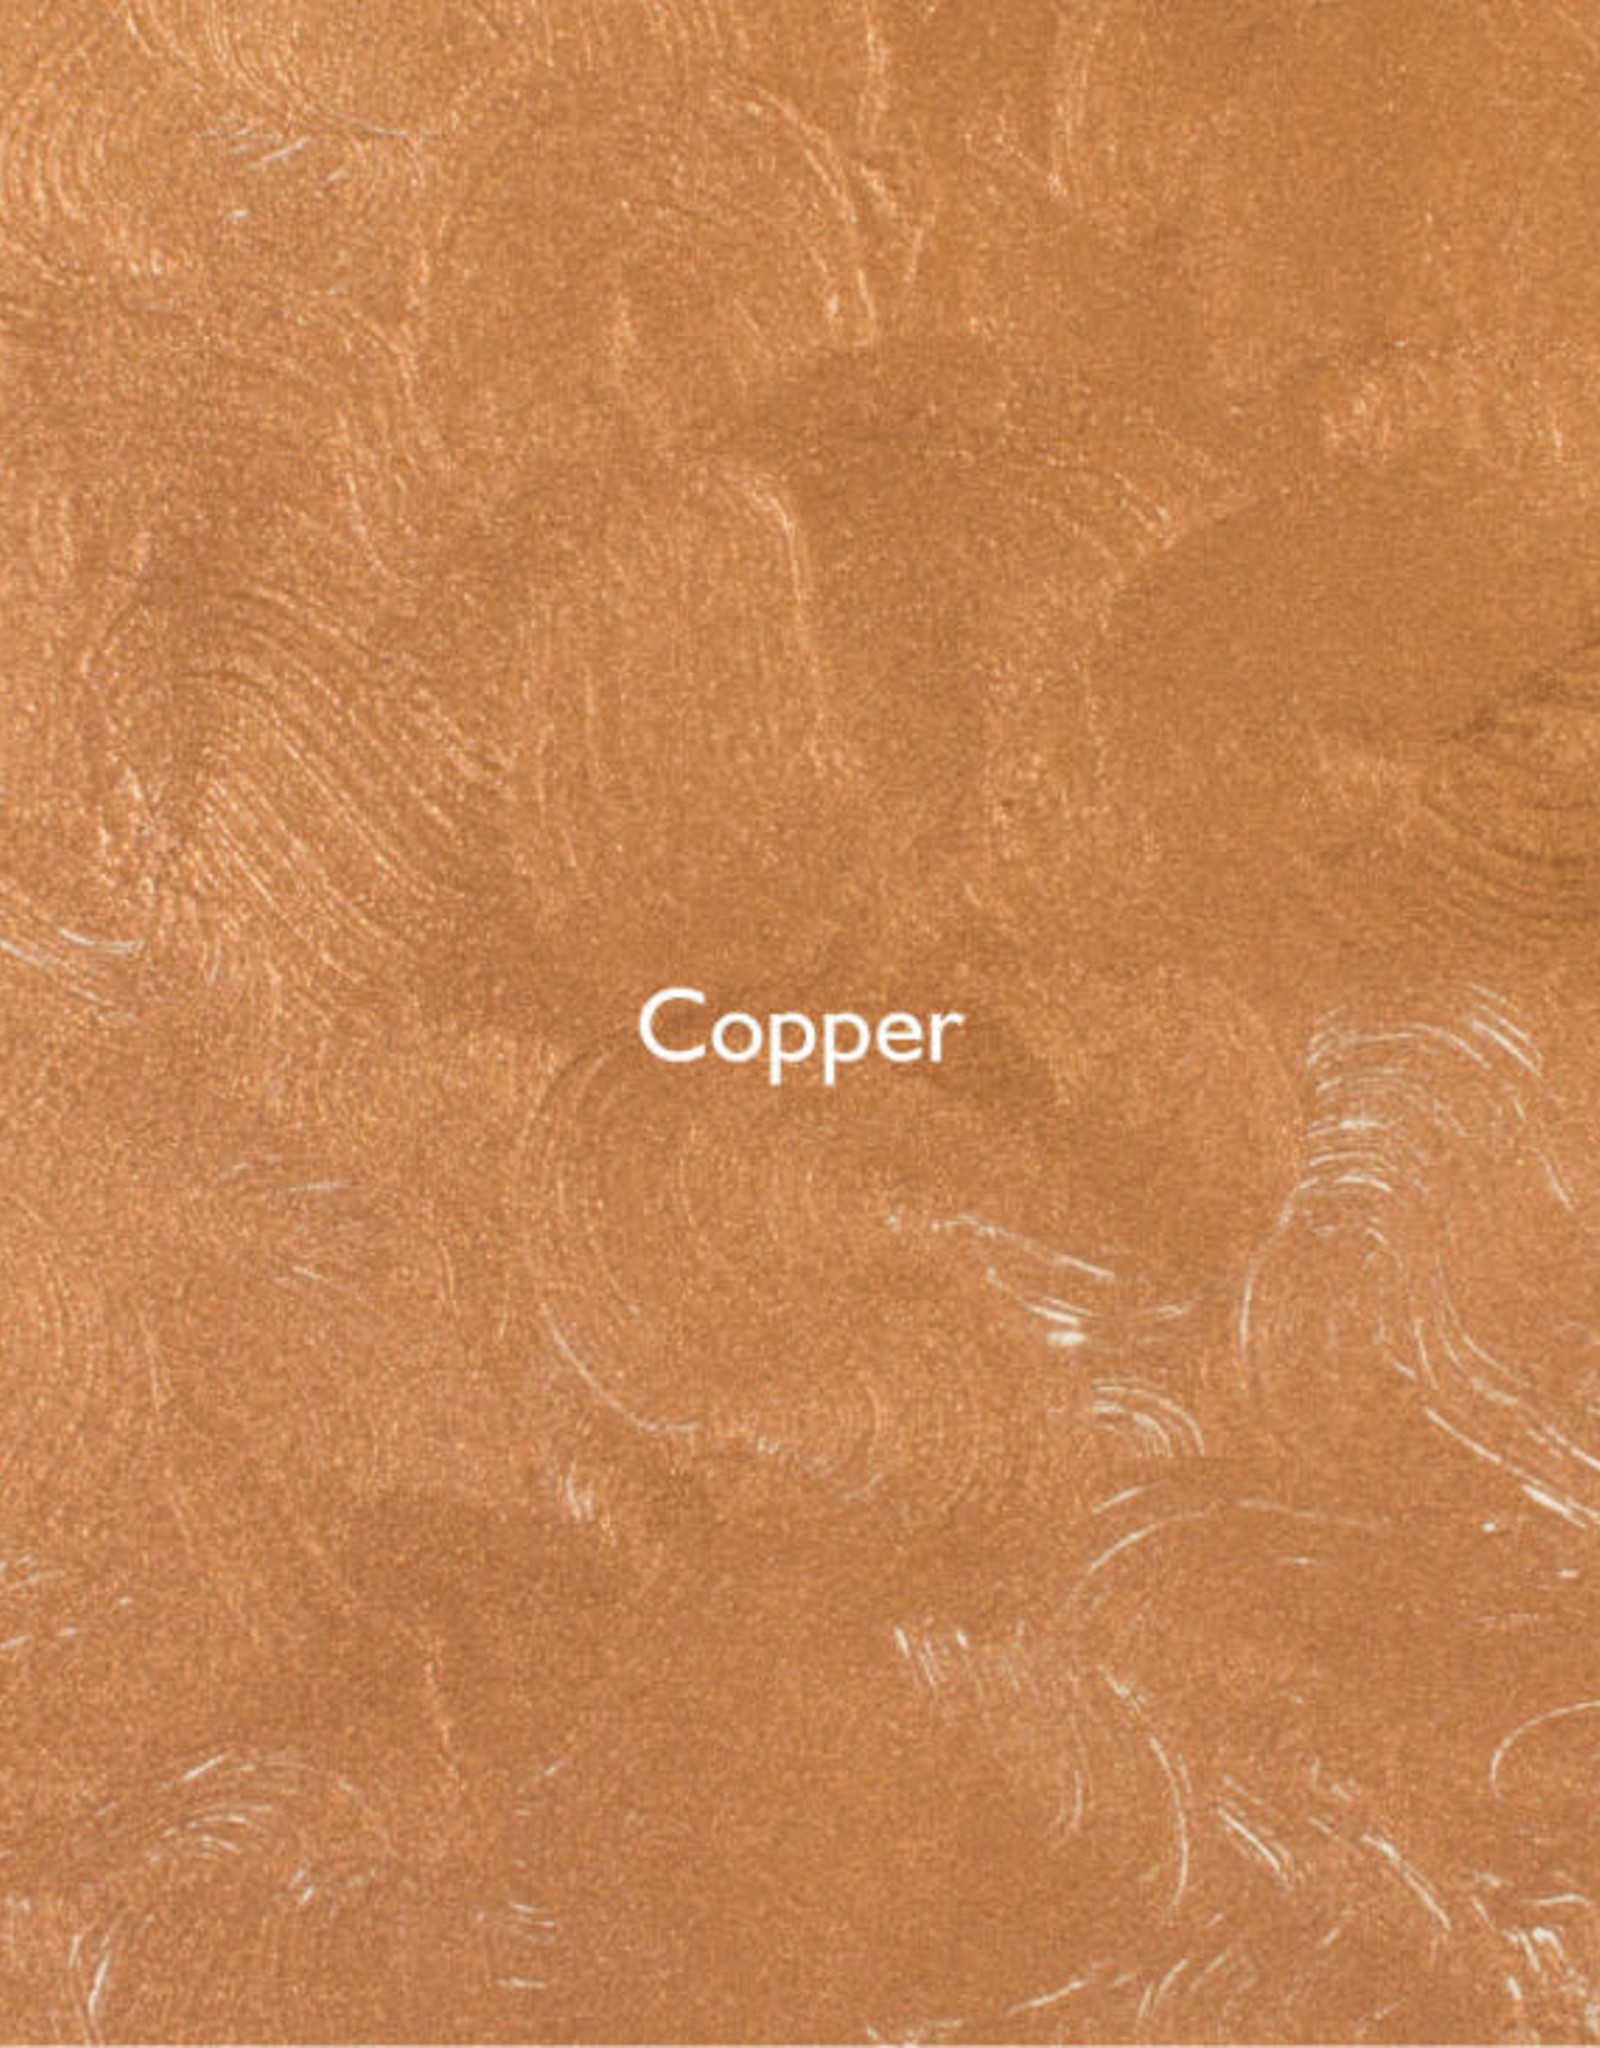 Gamblin Oil Paint, Copper, Series 4, Tube 37ml